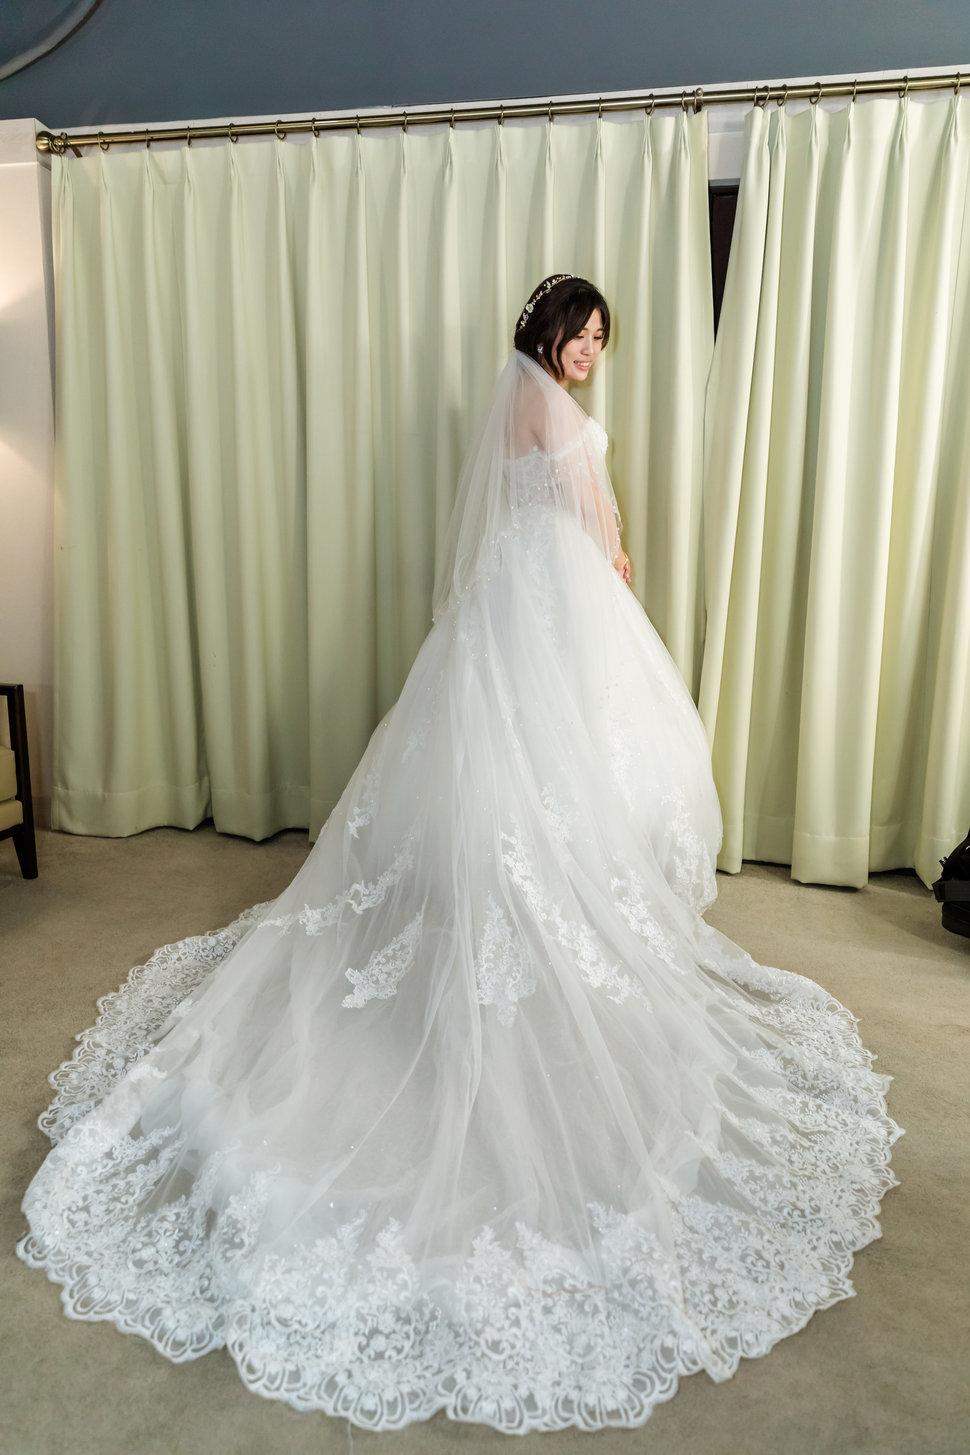 5D4_0816 - Promaker婚禮紀錄攝影團隊婚攝豪哥《結婚吧》